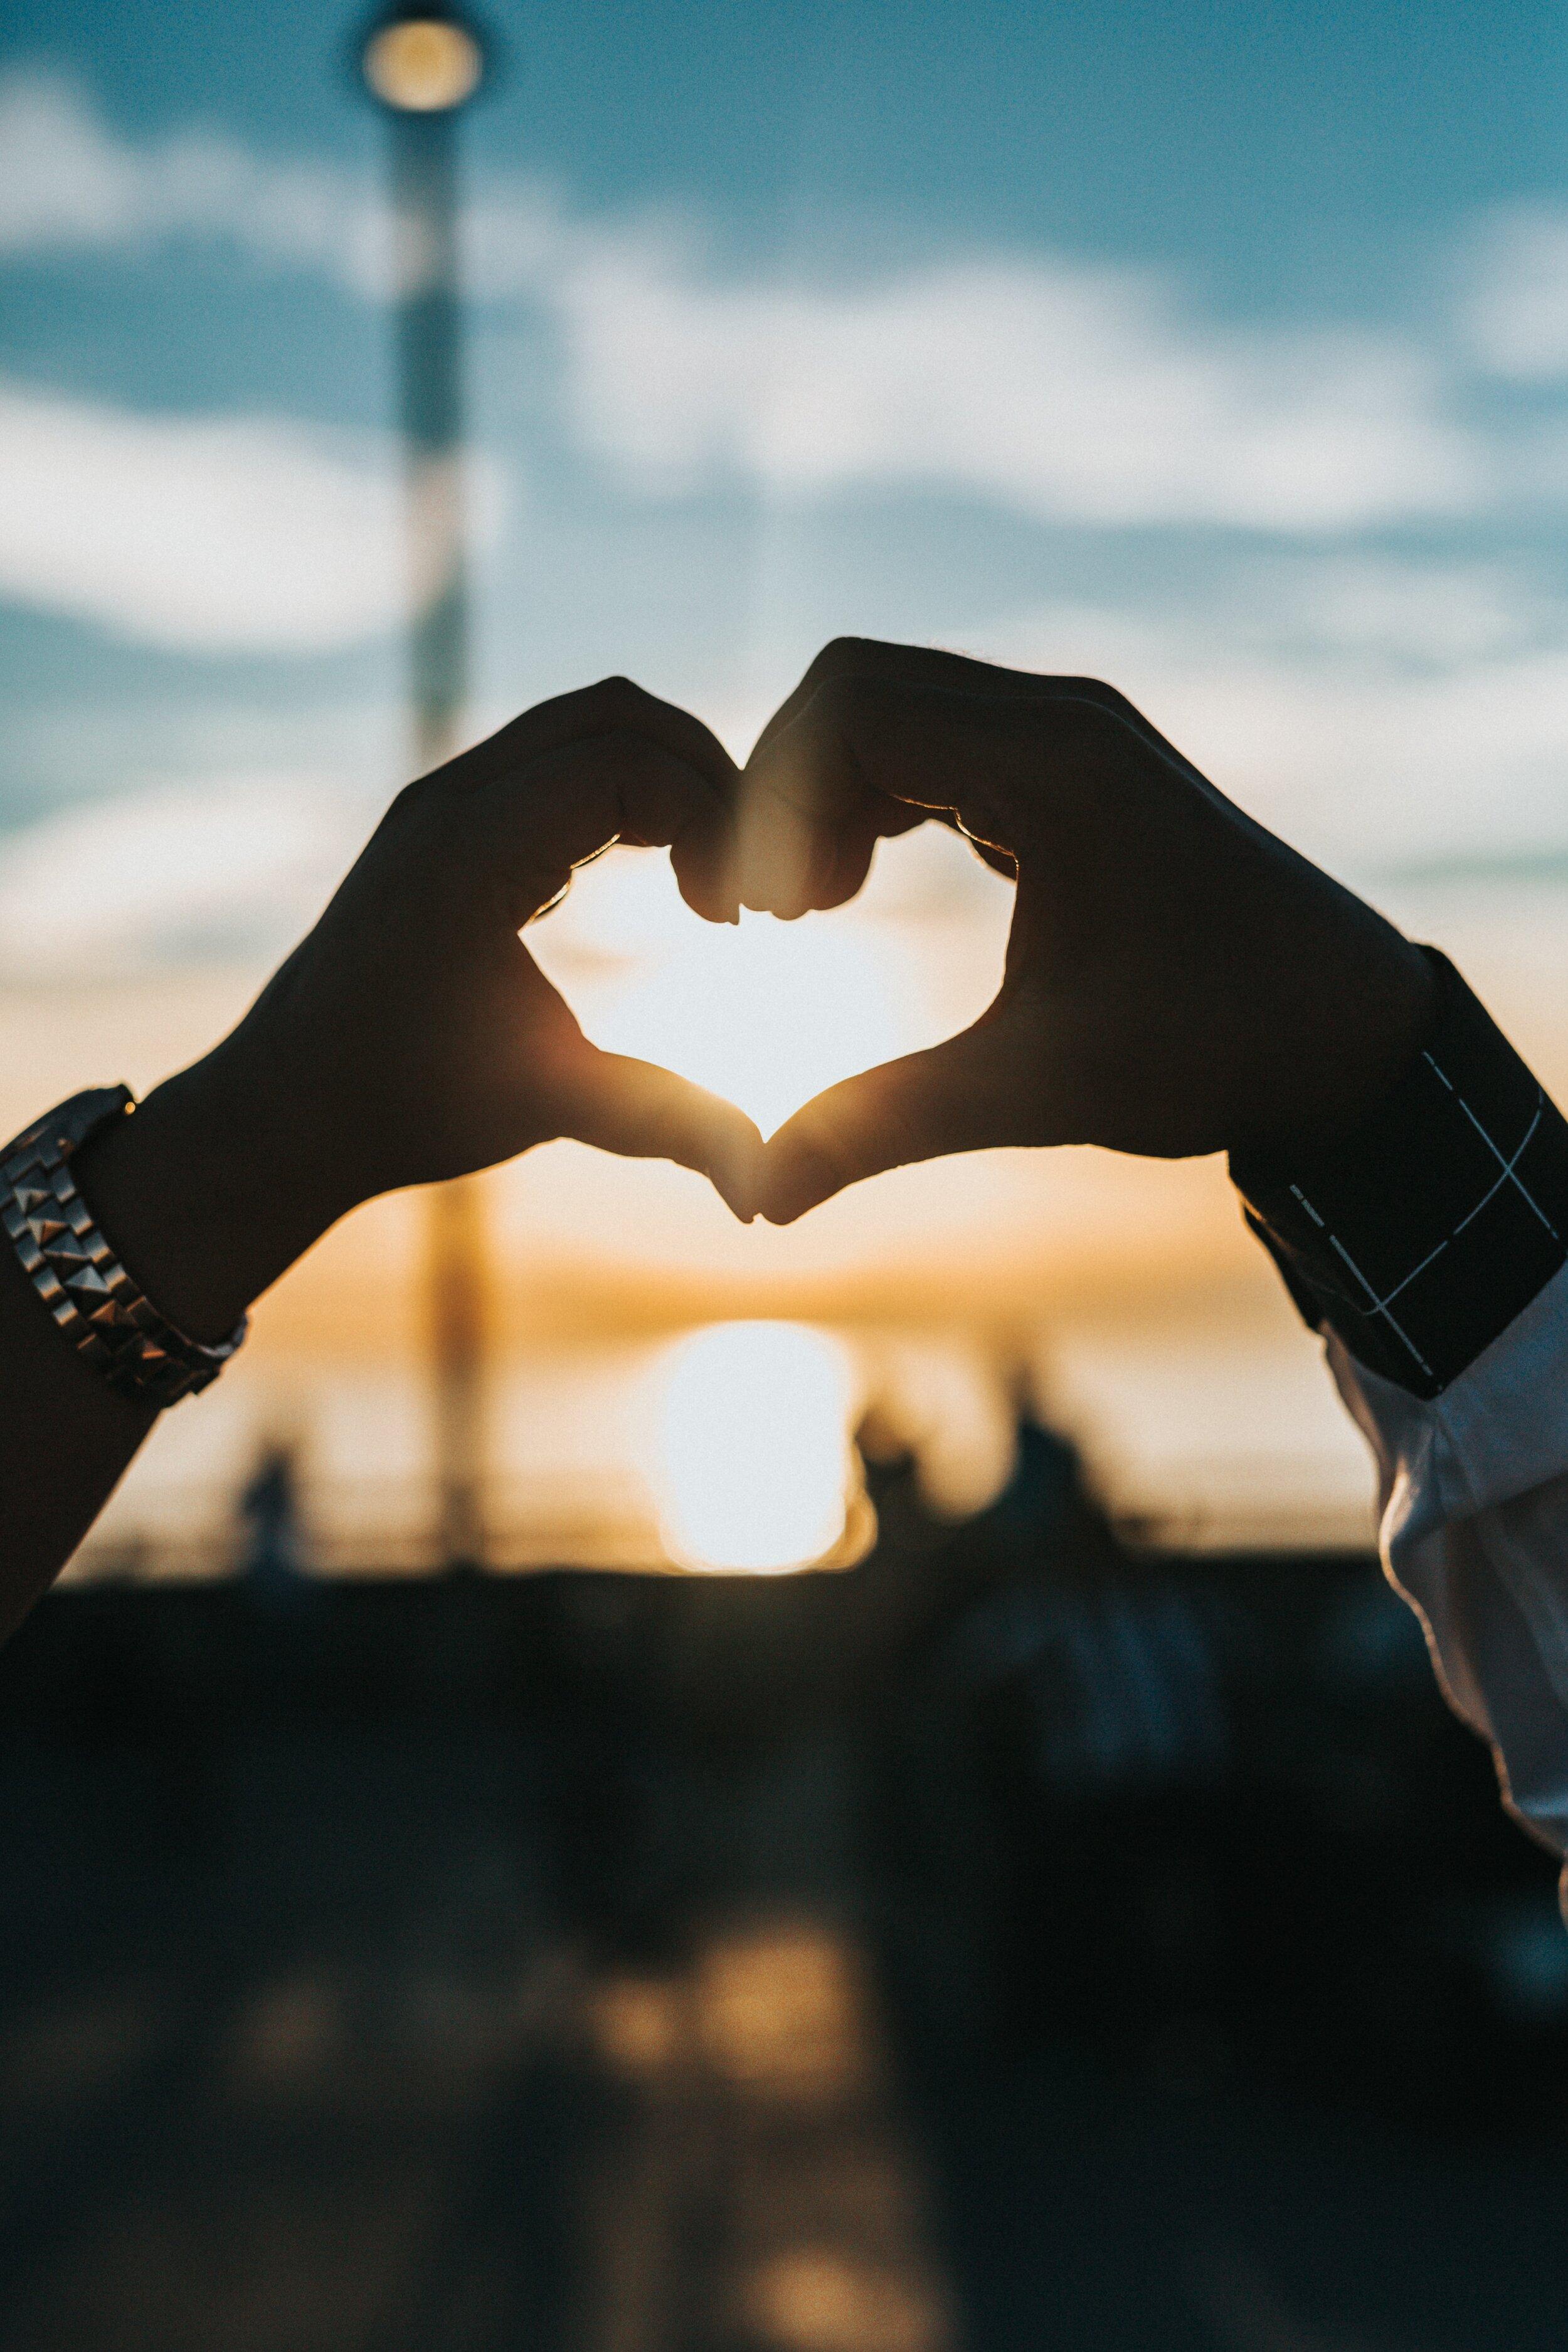 Love Hand Heart Photo by Tyler Nix on Unsplash